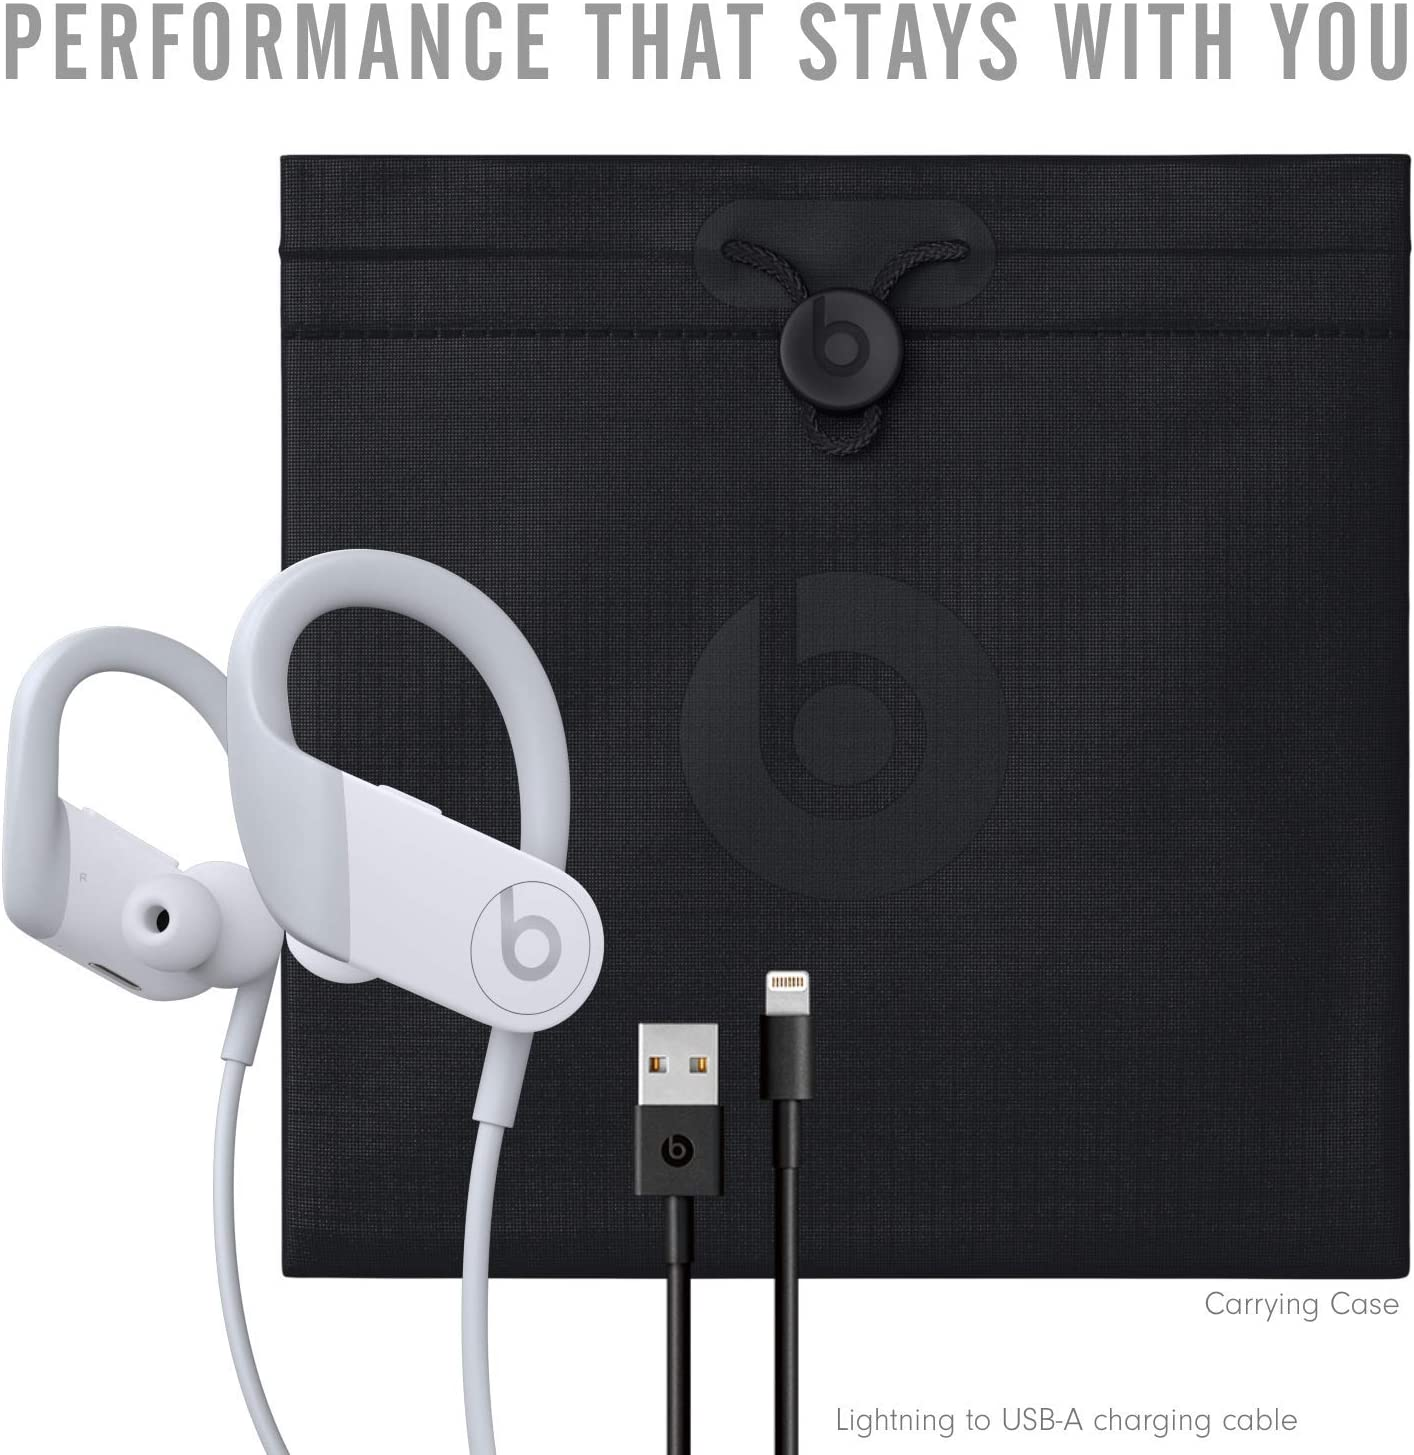 Beats by Dre Powerbeats High-Performance Wireless Earphones - White - MWNW2LL/A (Renewed)